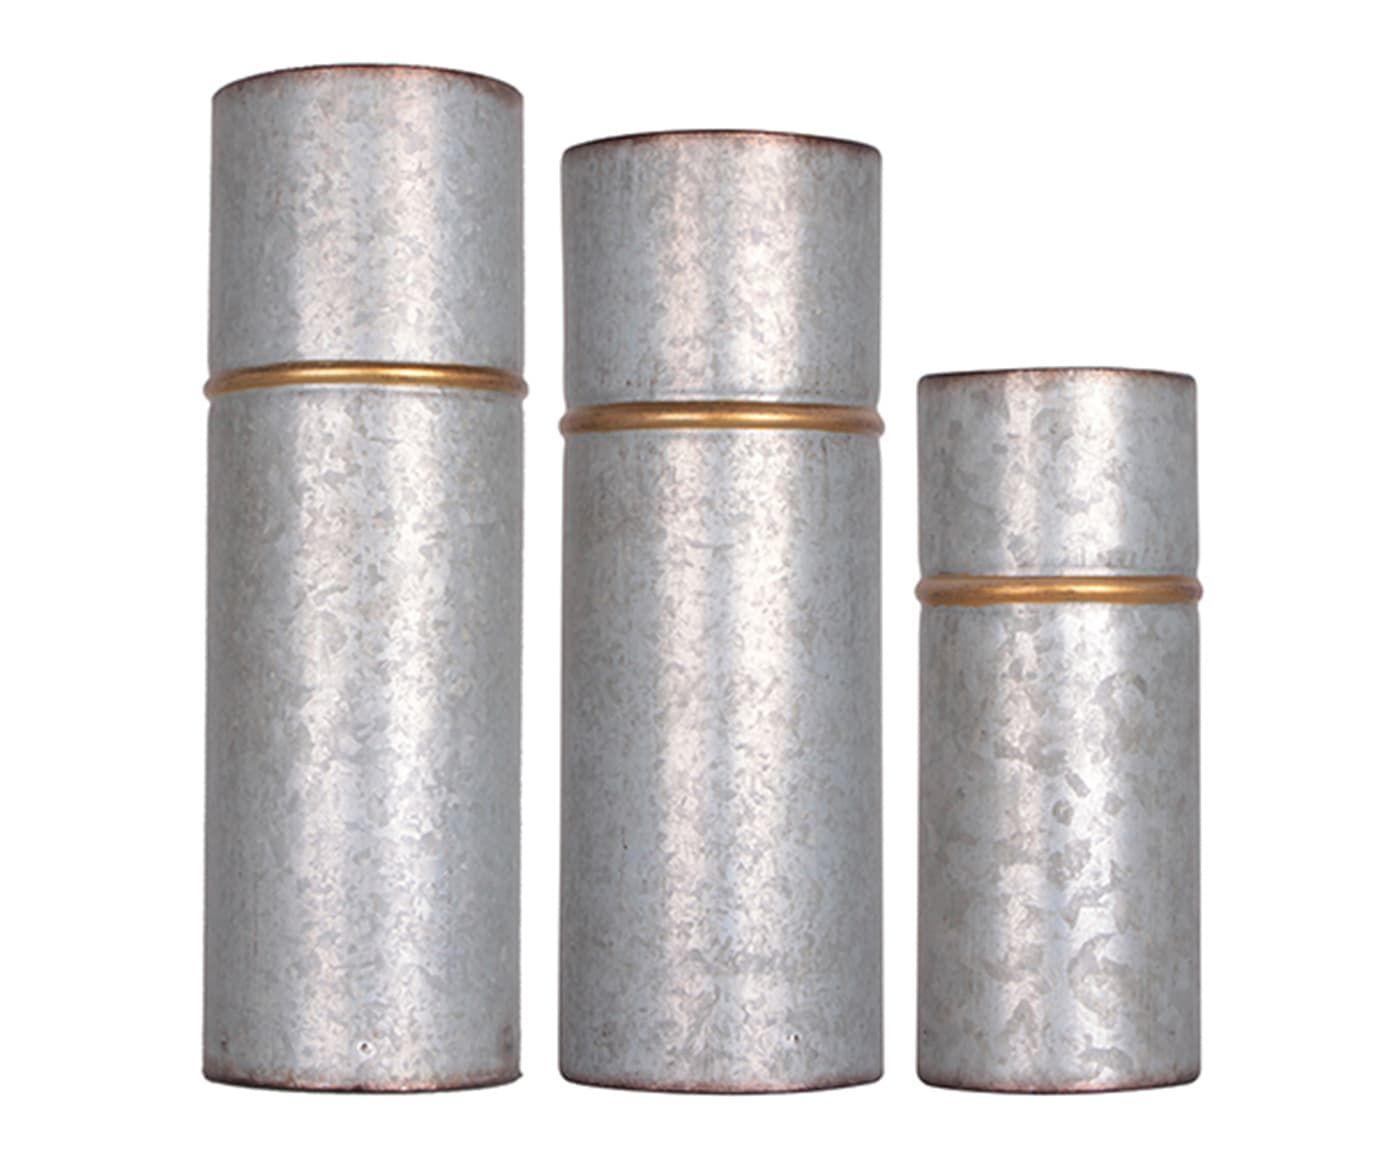 Jogo de Vasos Anel - 15X50cm | Westwing.com.br